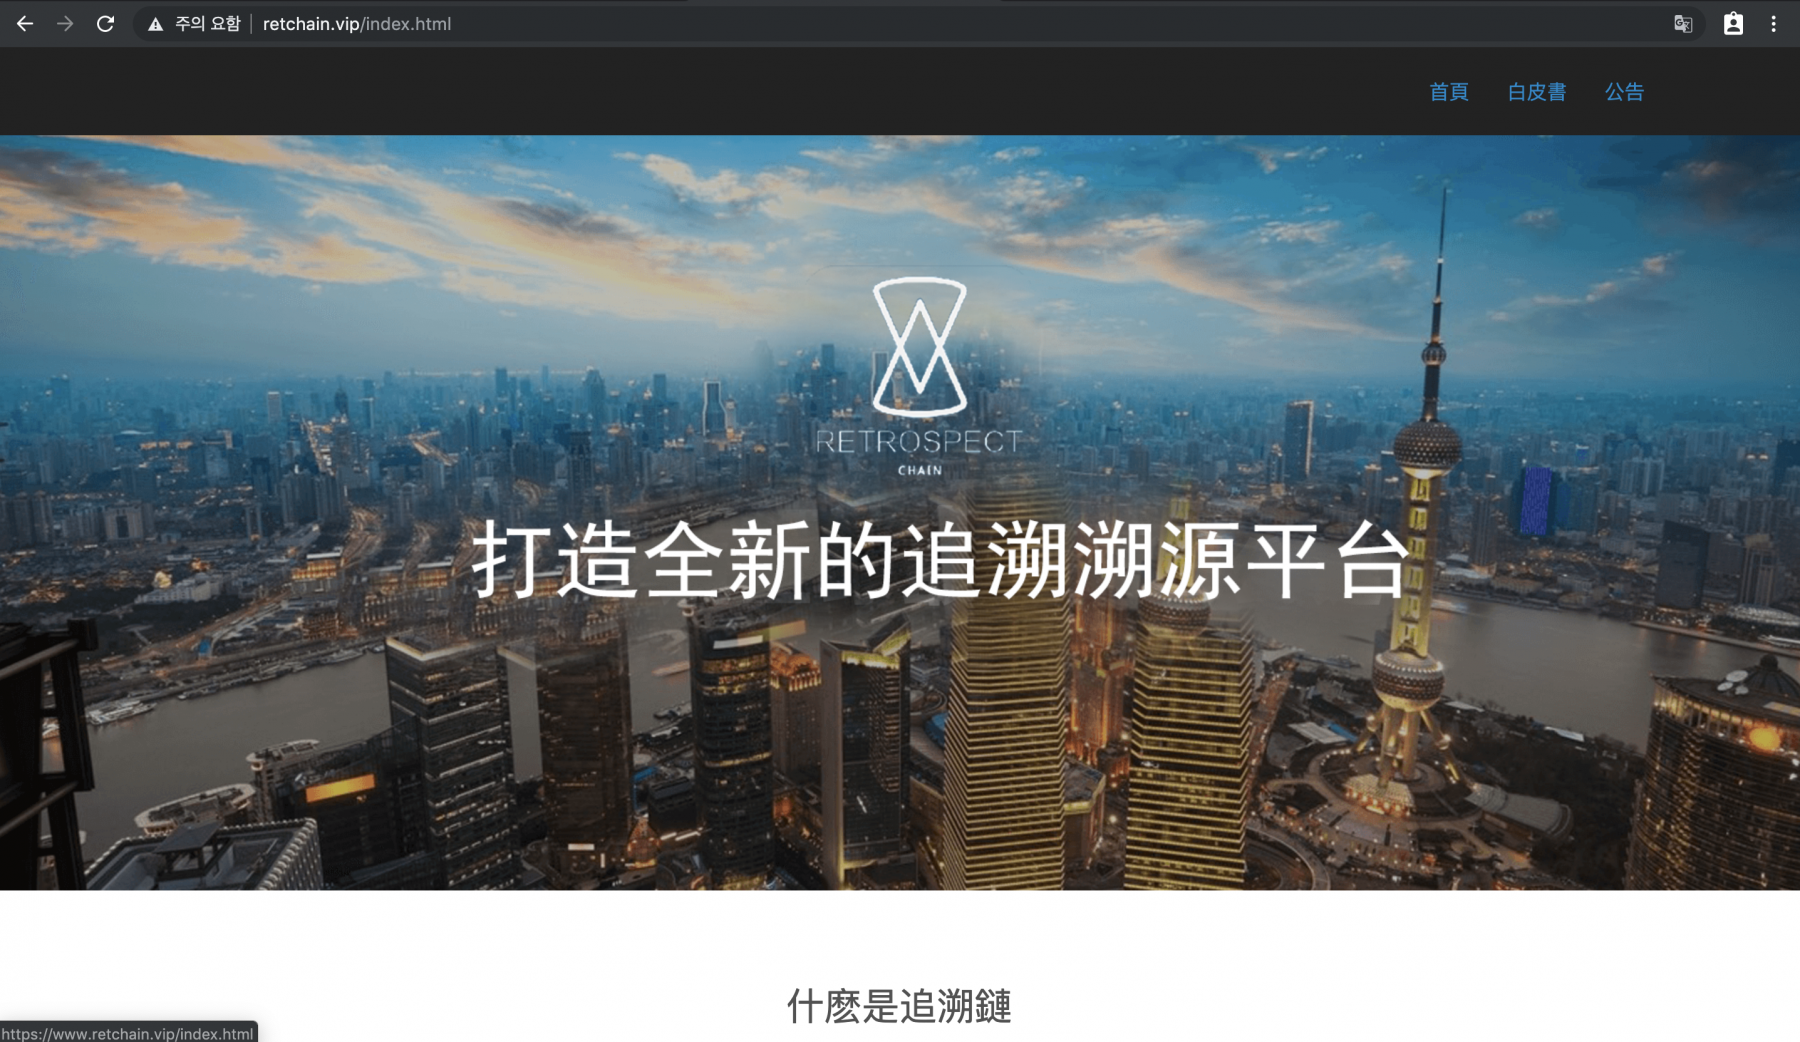 Screenshot of DET website